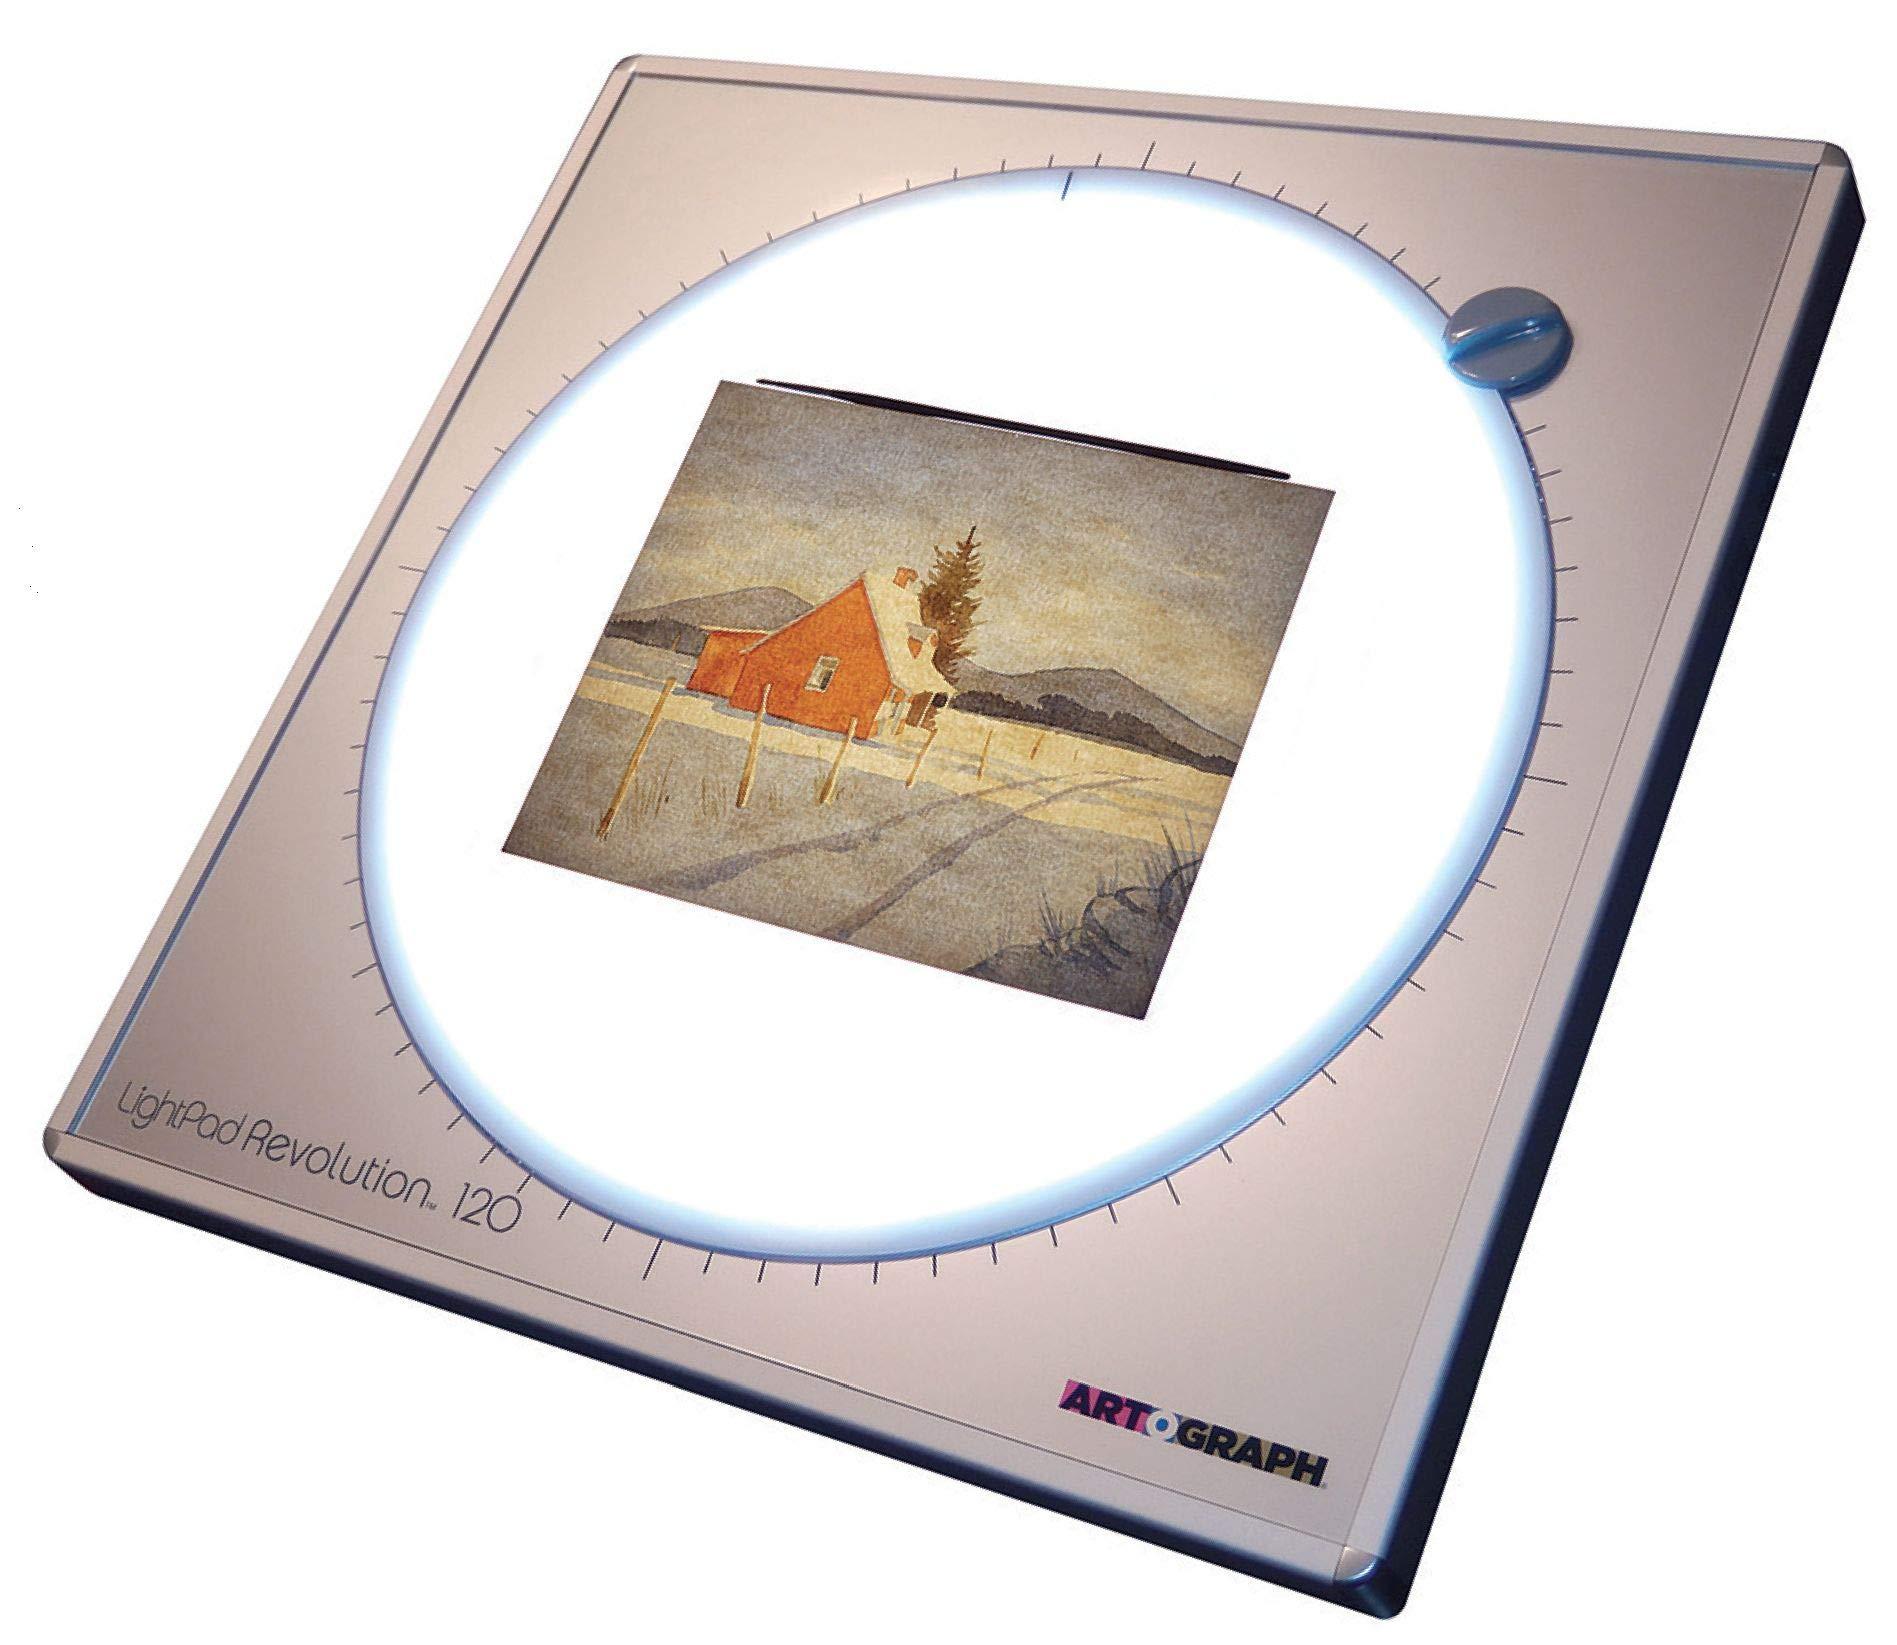 Artograph LightPad Revolution 120 LED Light Box by Artograph